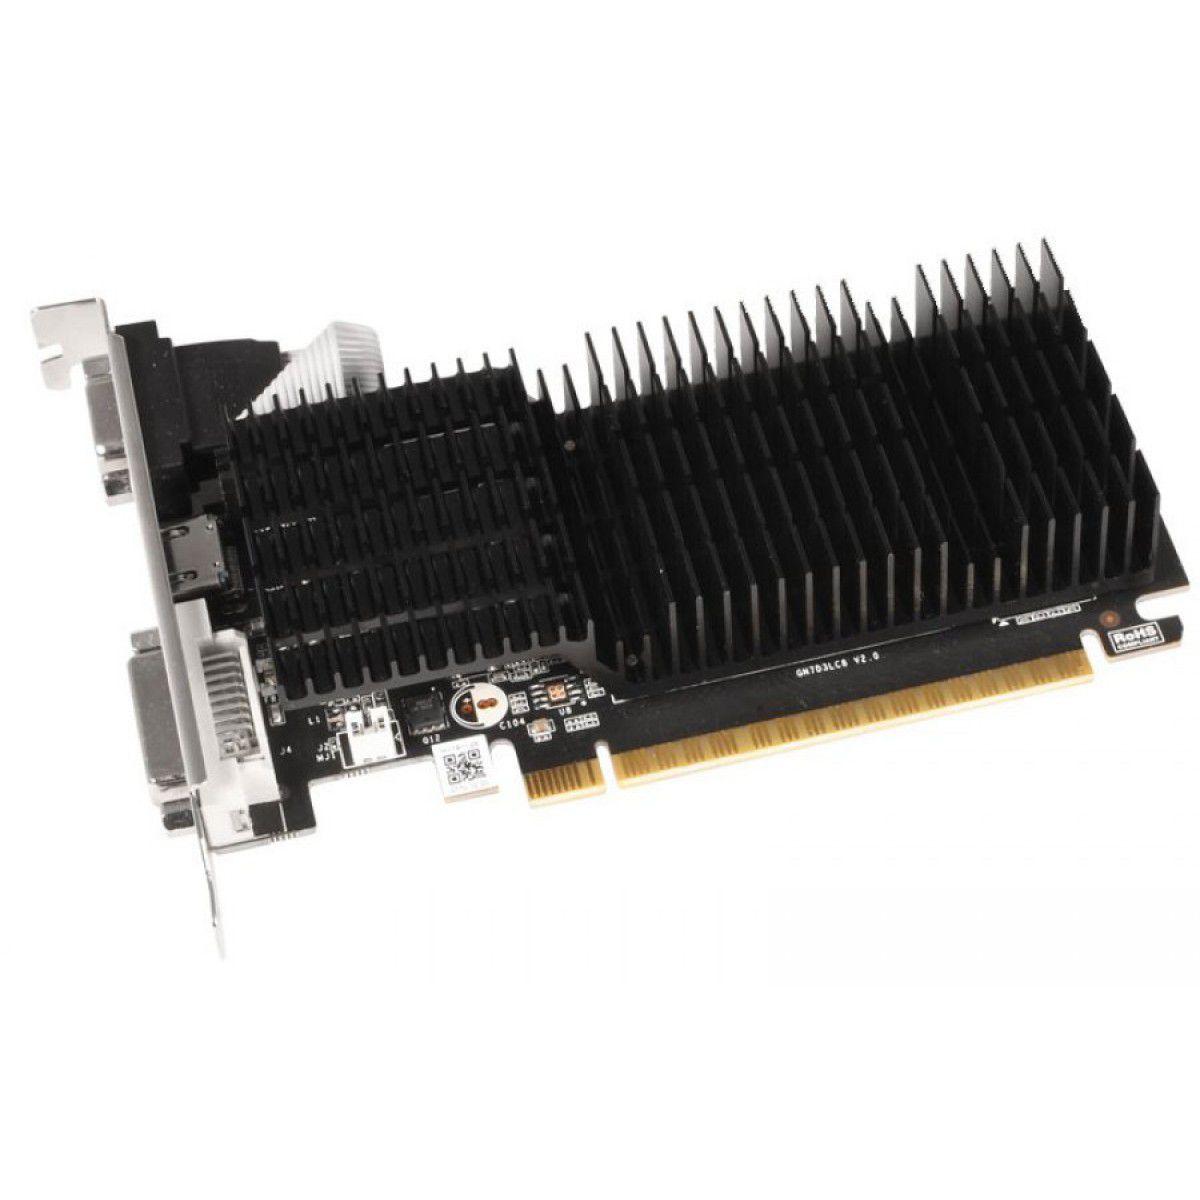 Placa de Vídeo Galax GeForce GT 710, 2GB DDR3, 64Bit, 71GPF4HI00GX